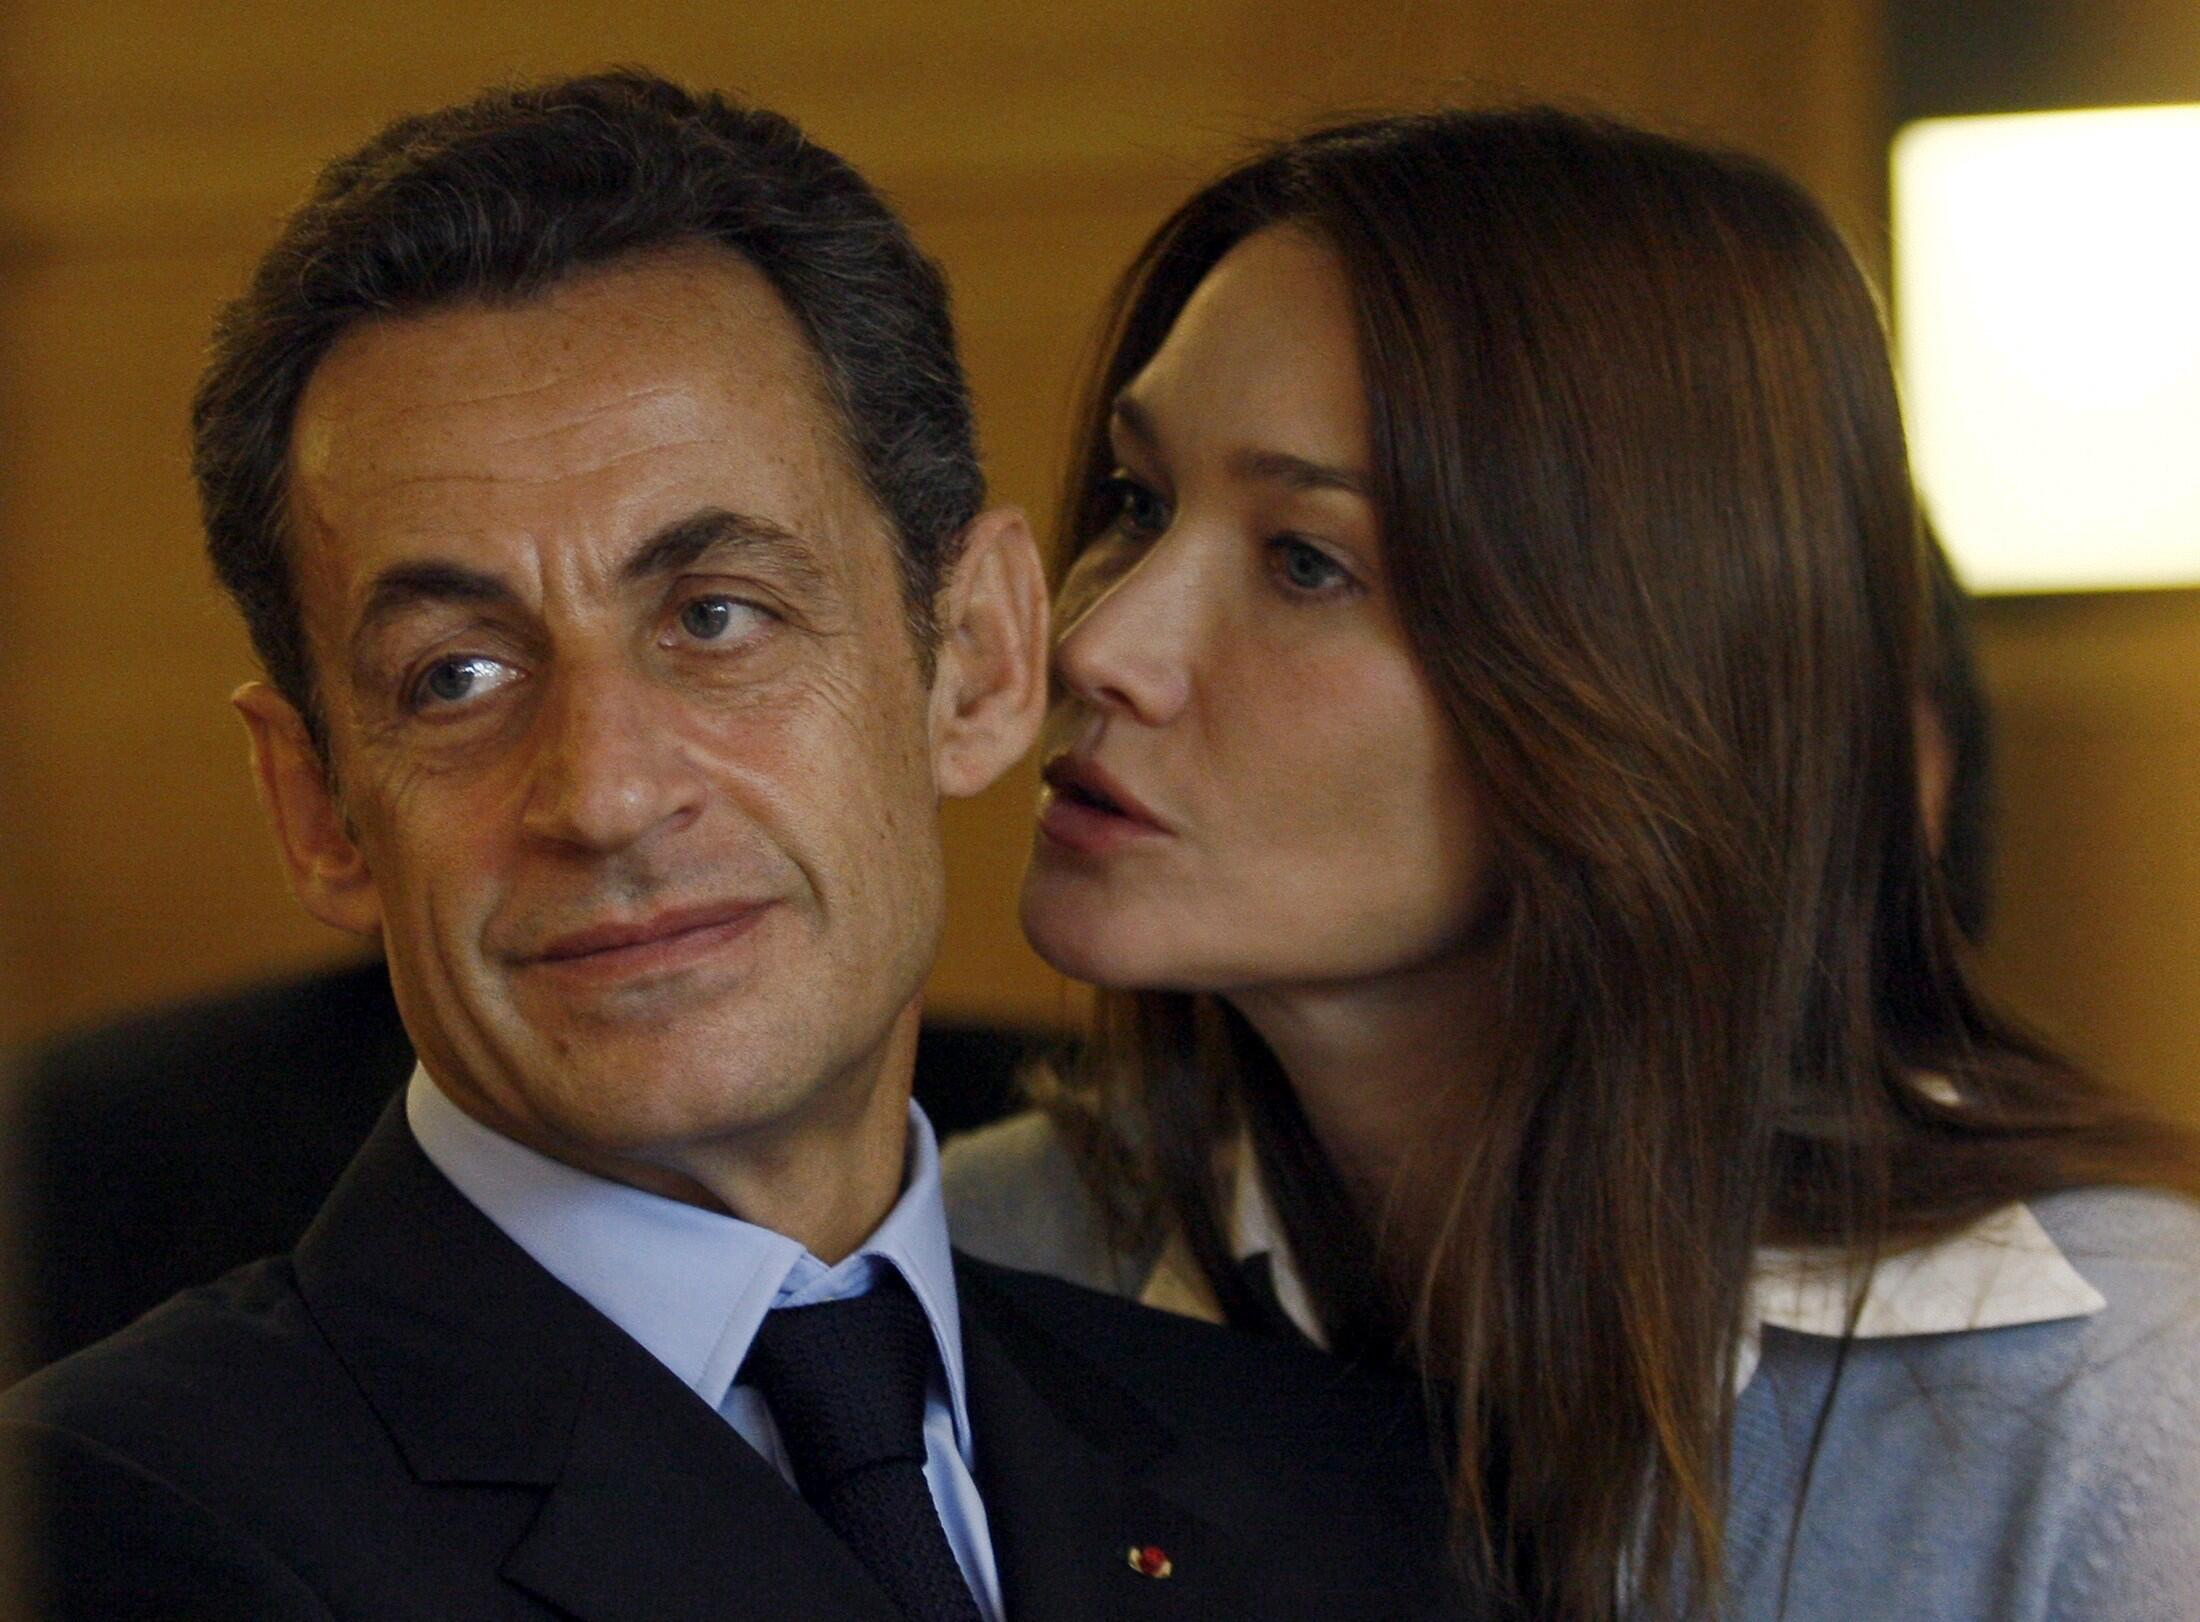 Николя Саркози и Карла Бруни 2 нобяря 2009 (архив)